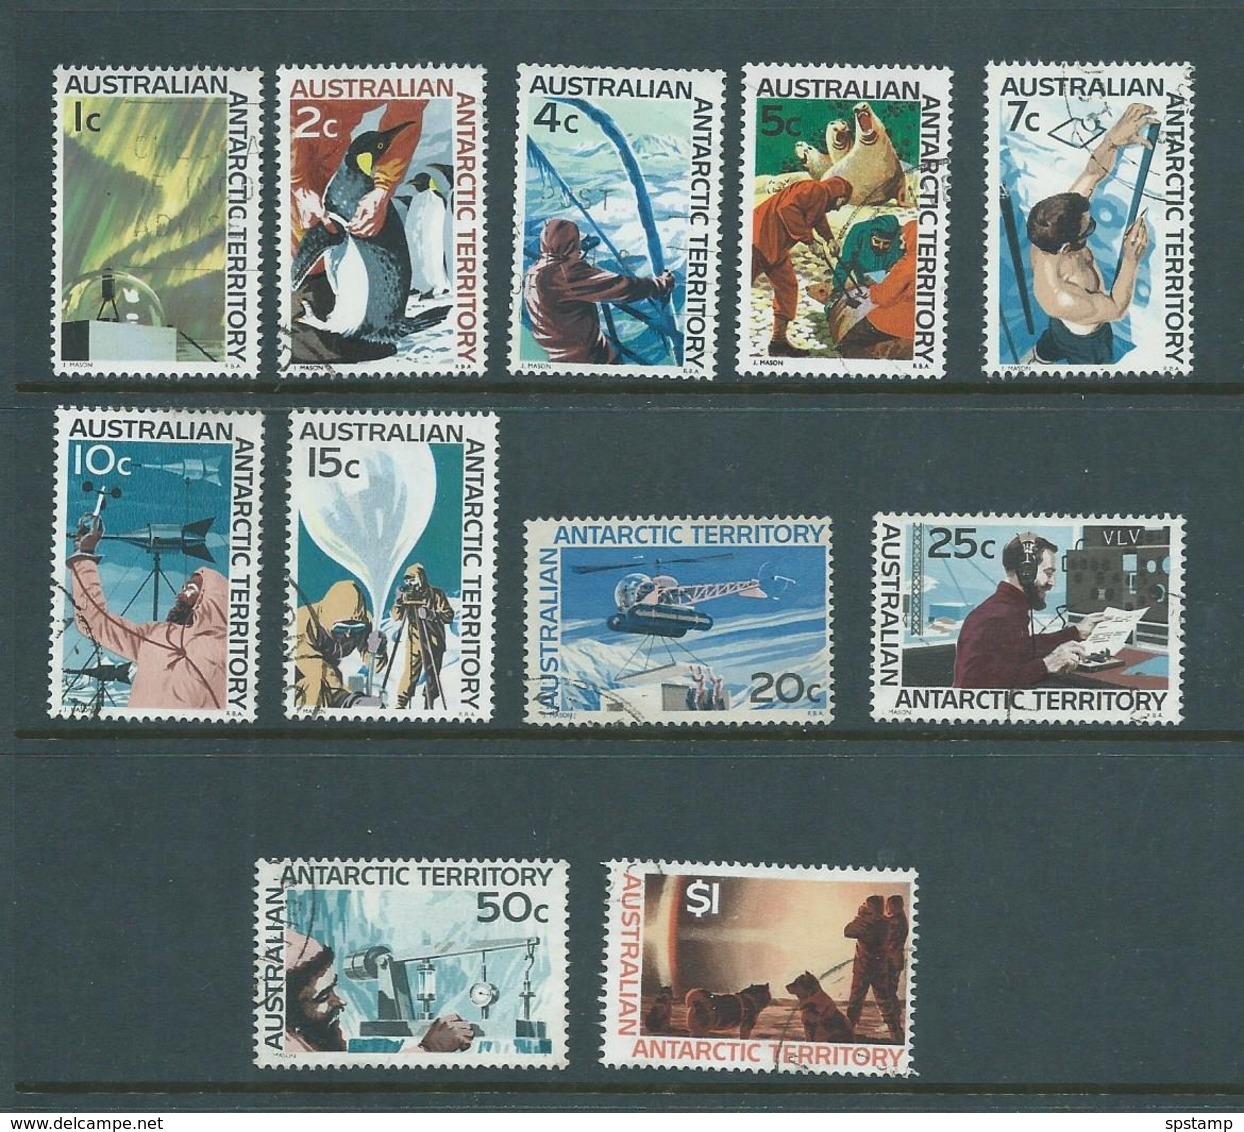 Australian Antarctic Territory 1966 Definitive Scenes Set 11 FU - Australian Antarctic Territory (AAT)